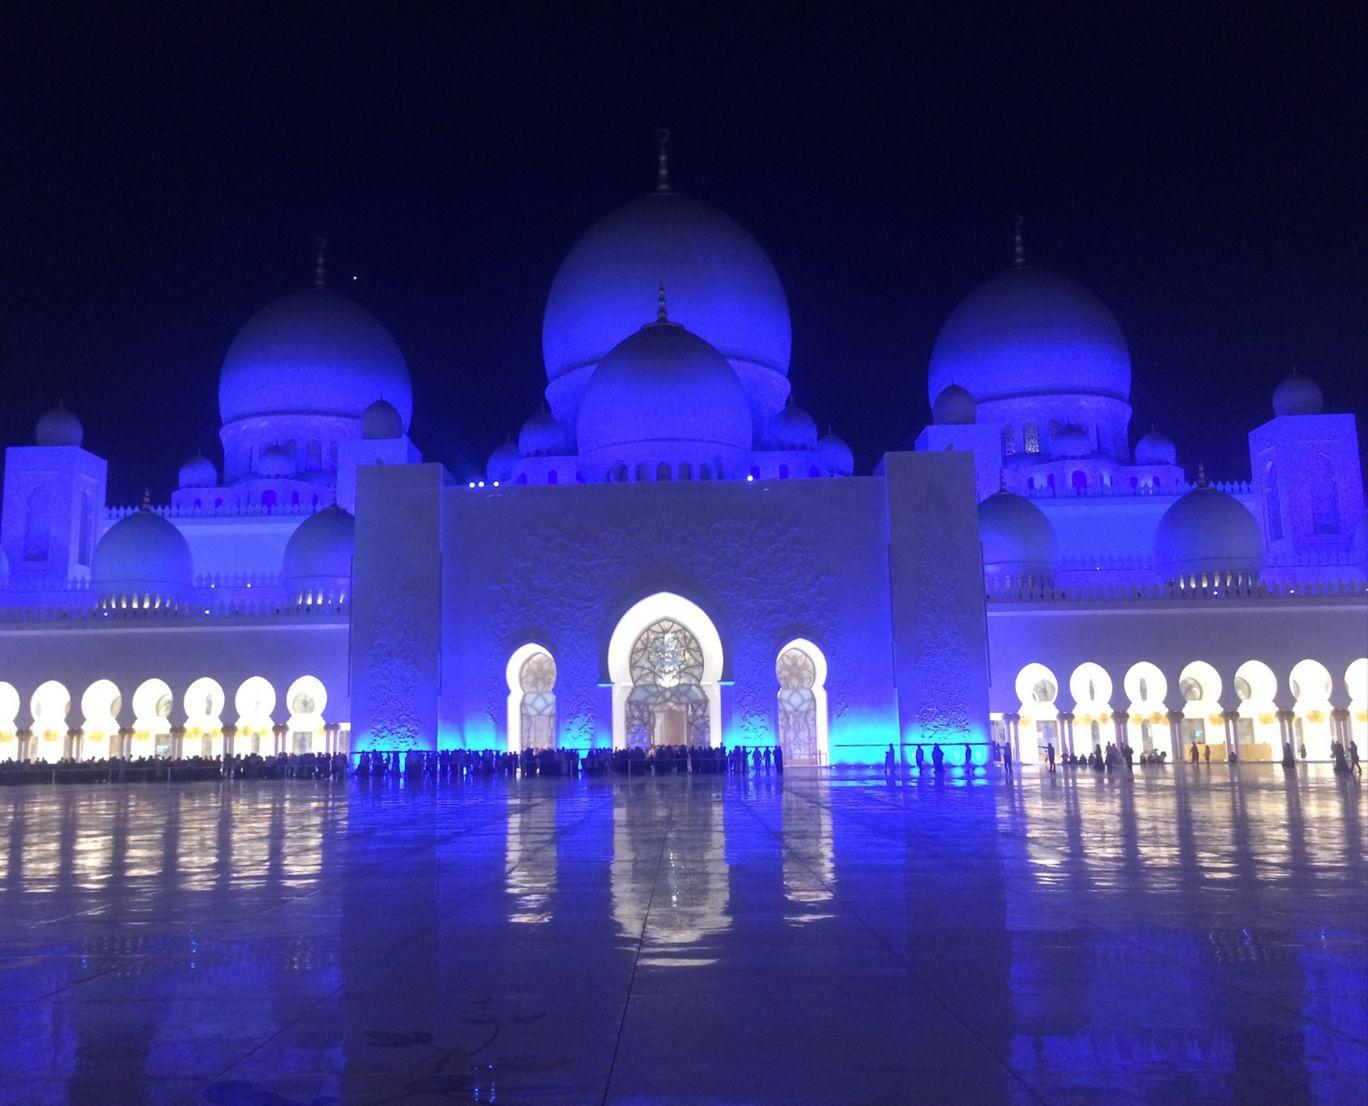 Photo of Sheikh Zayed Mosque - Abu Dhabi - United Arab Emirates By The2Backpacks